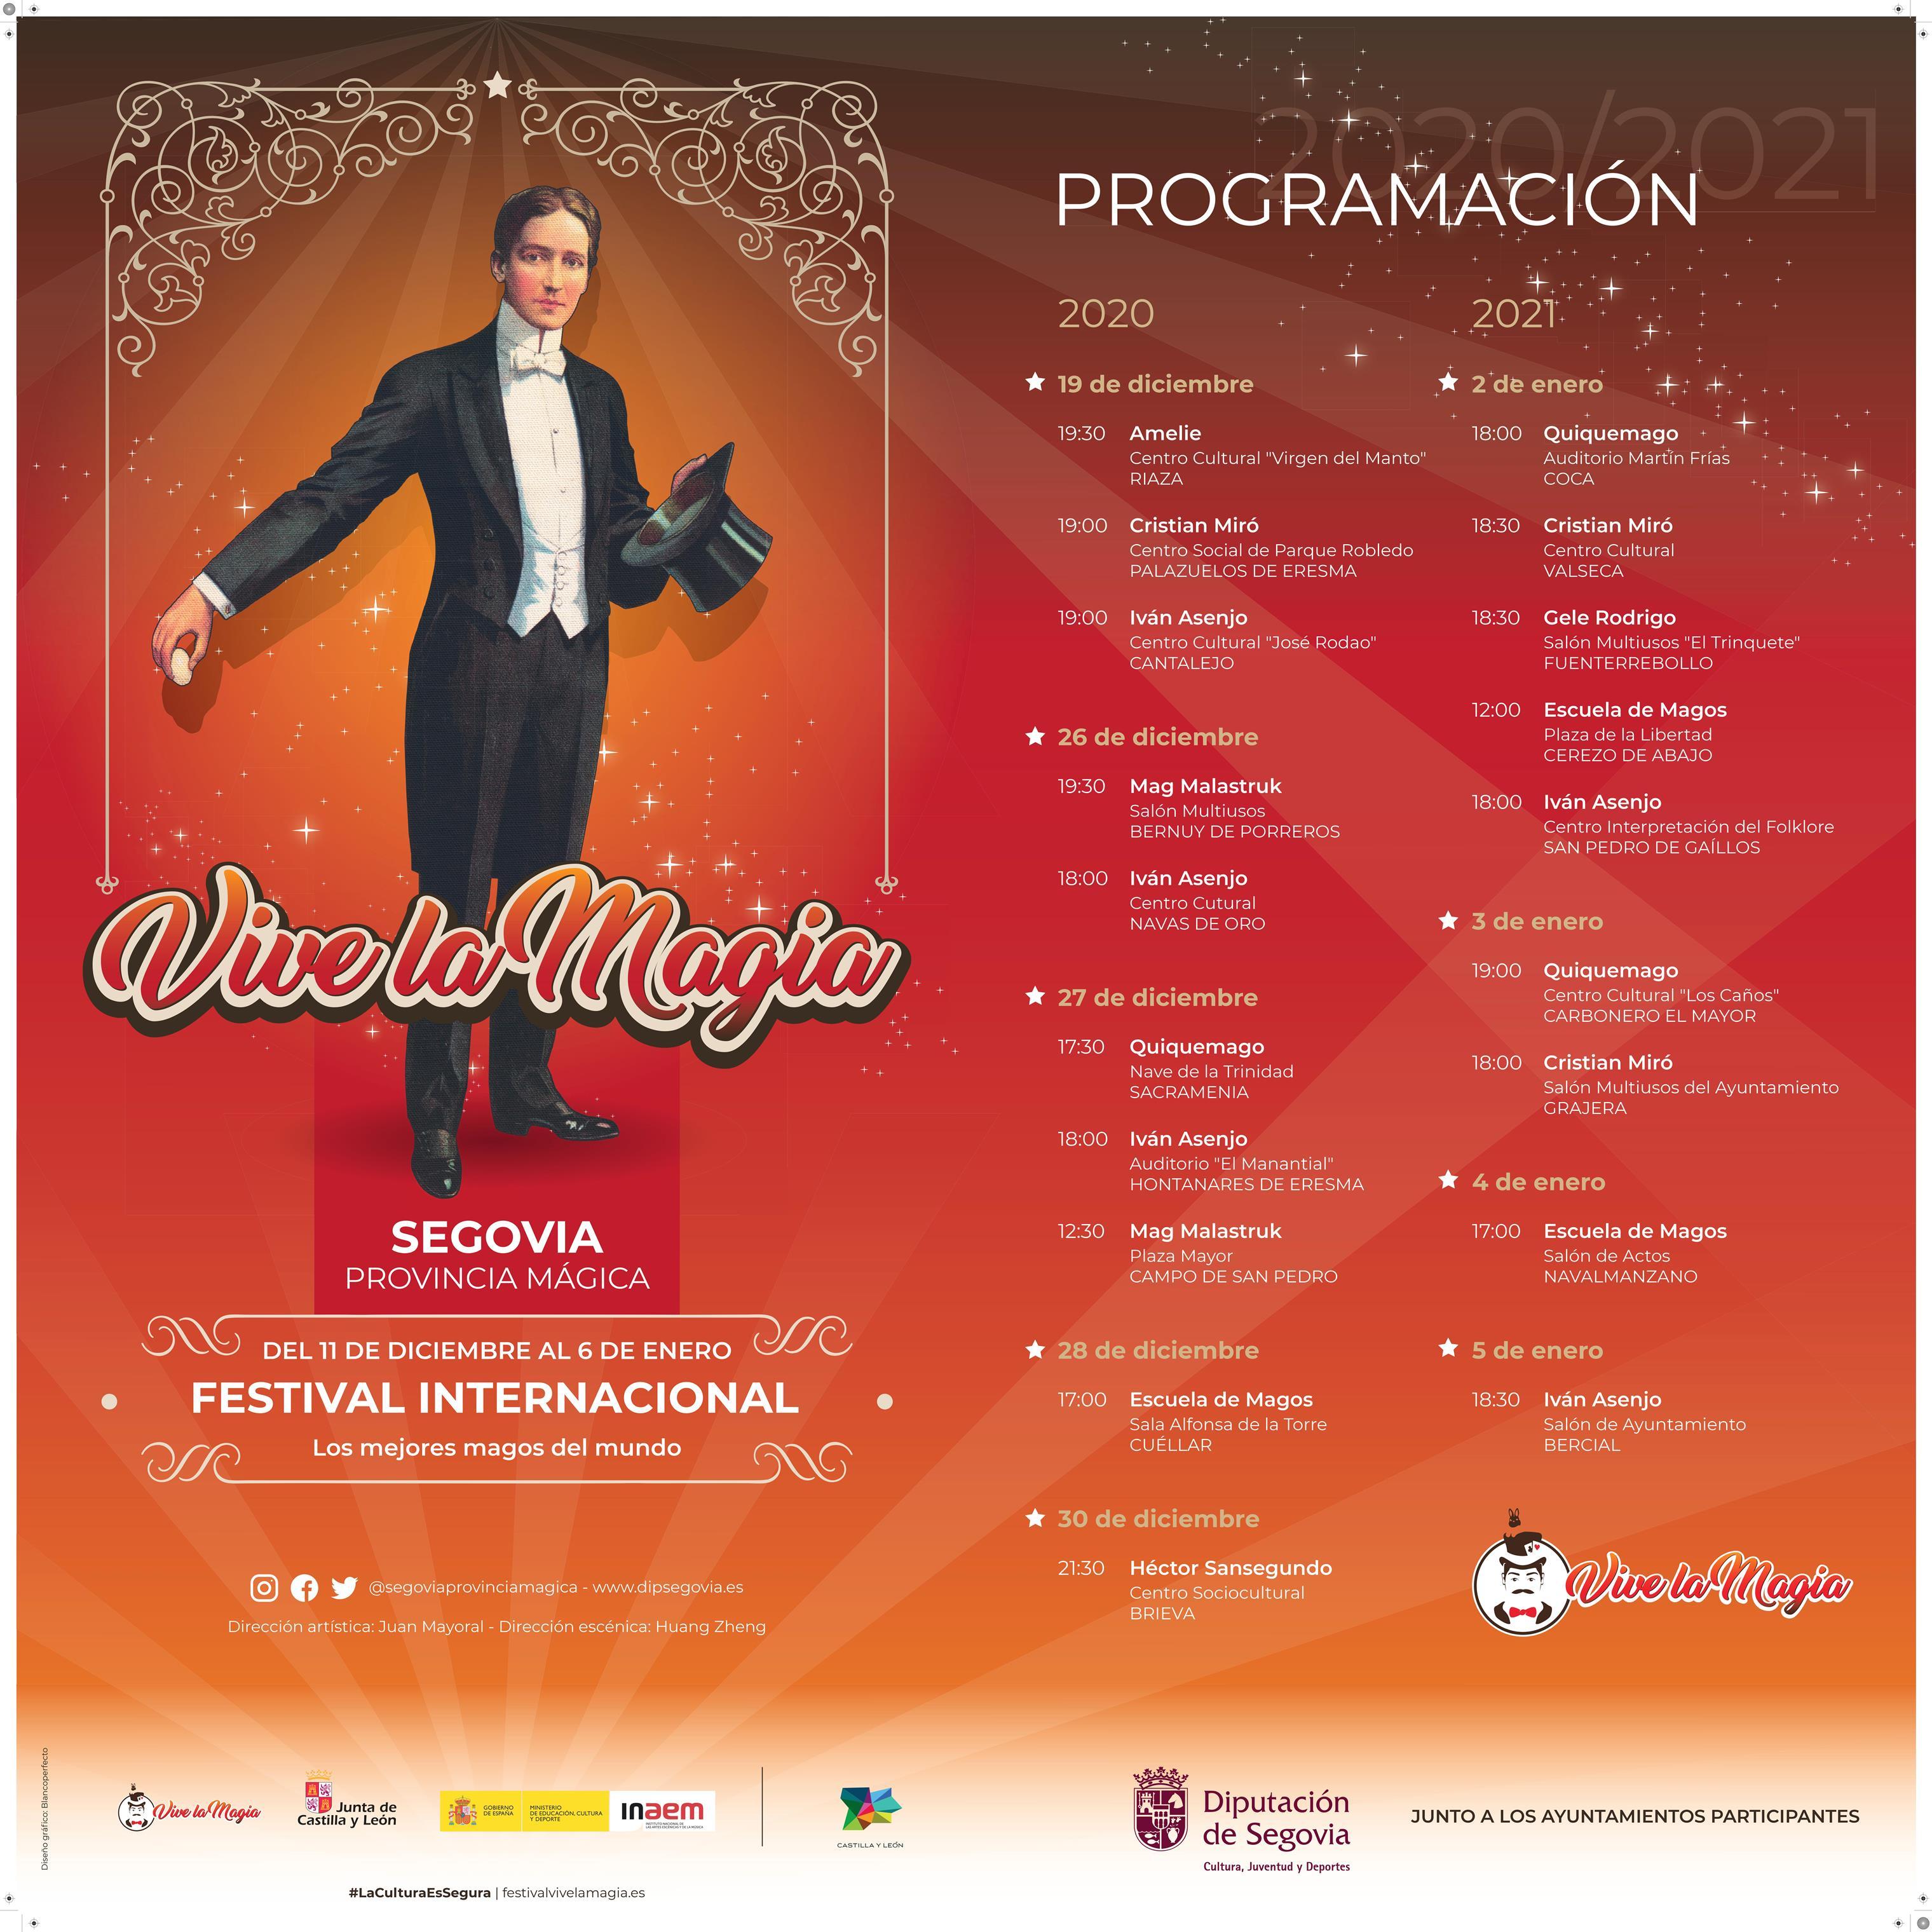 Segovia Magic Province complete